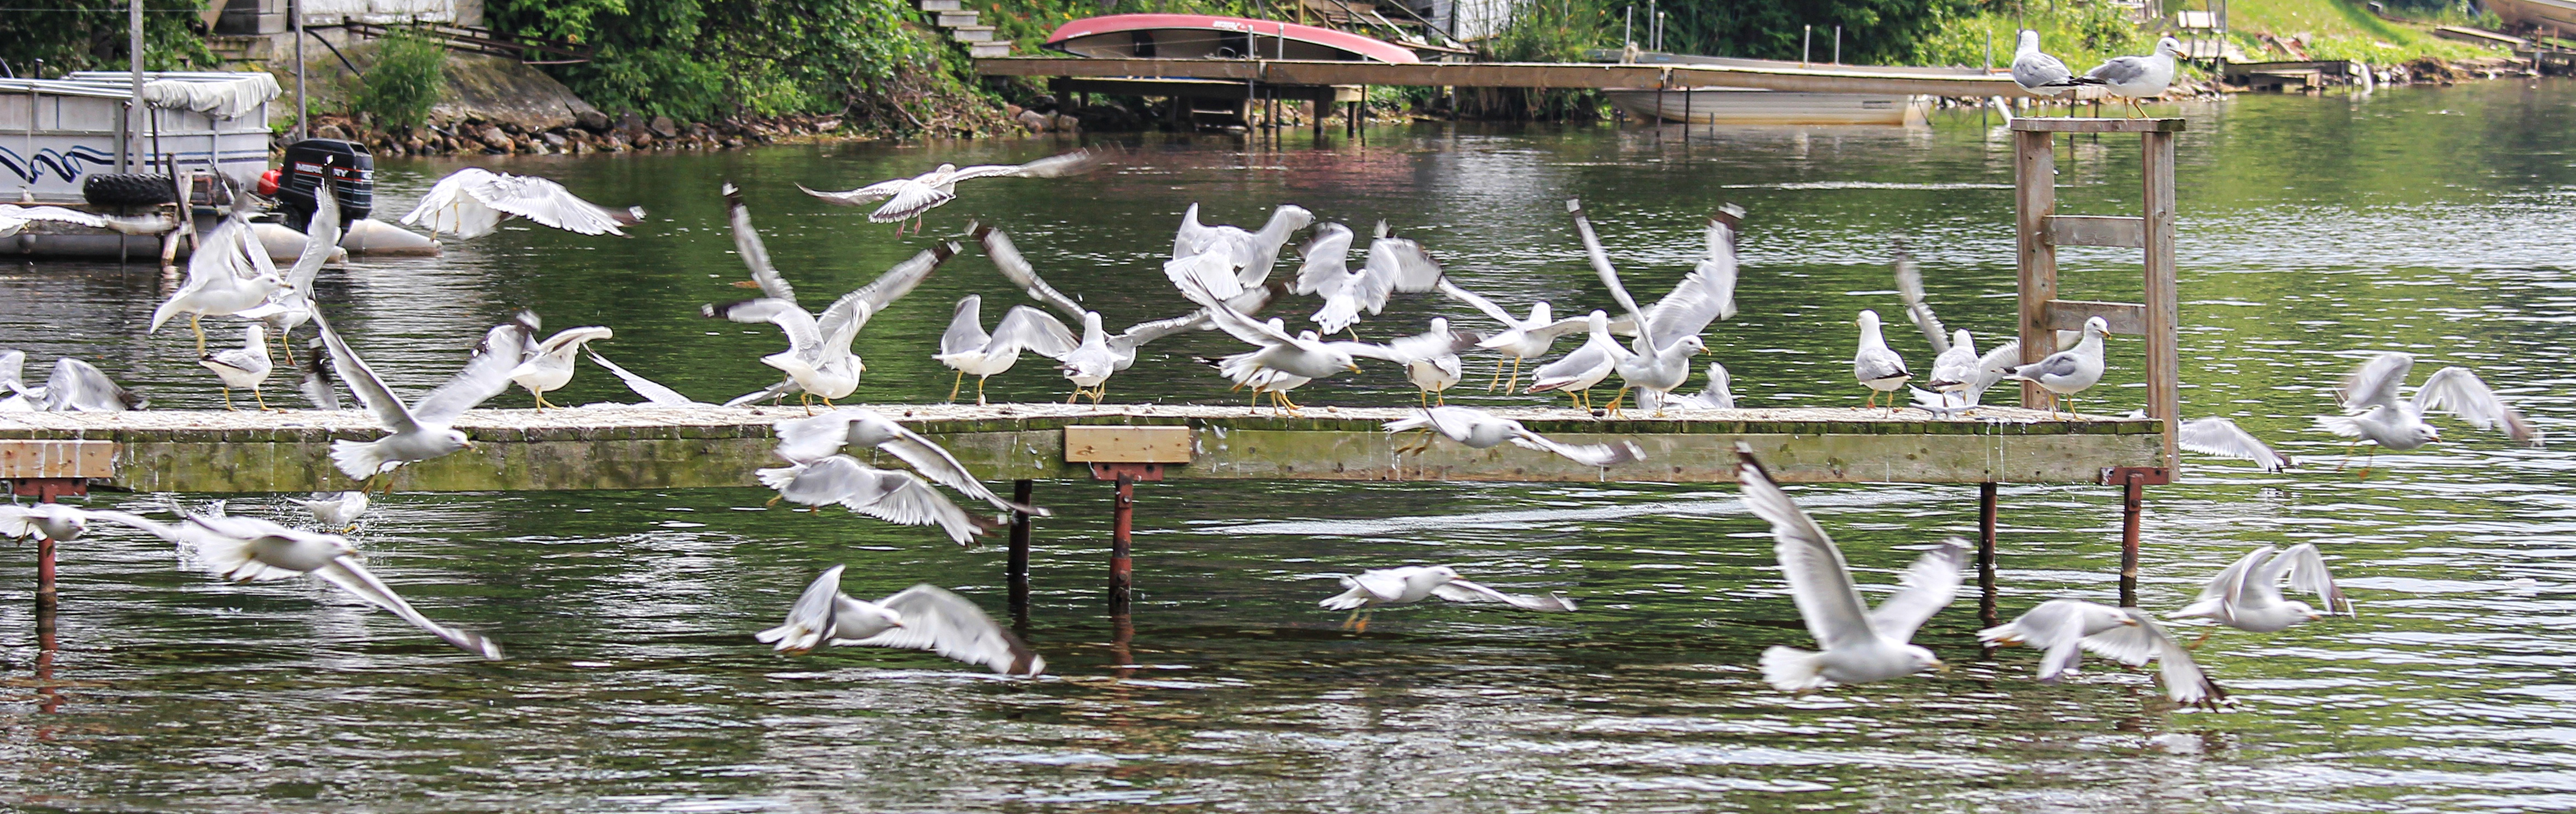 Sea gulls!